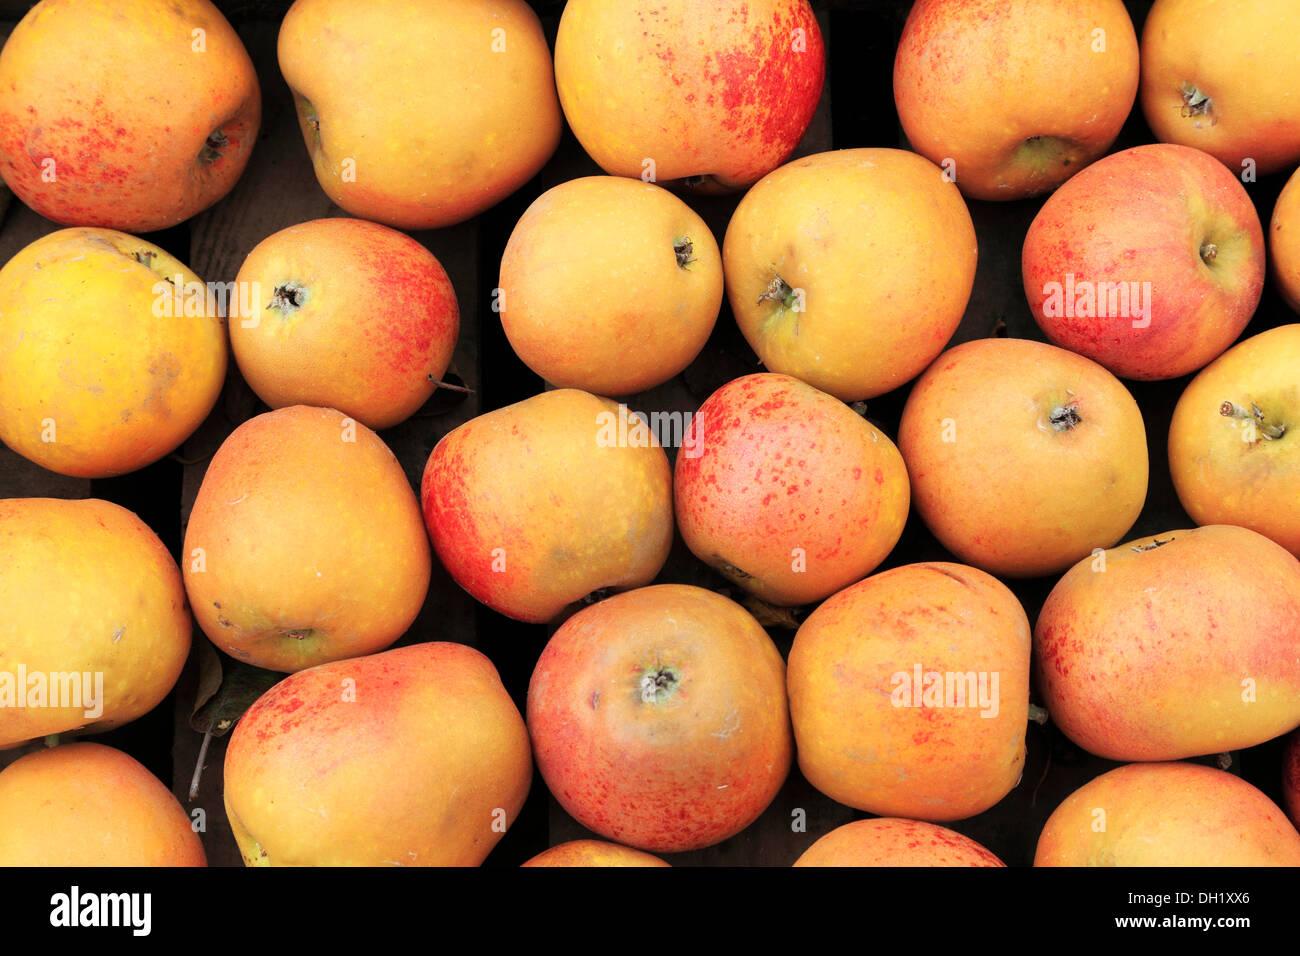 Apple 'Norfolk Royal Russet', farm shop display, apples UK - Stock Image